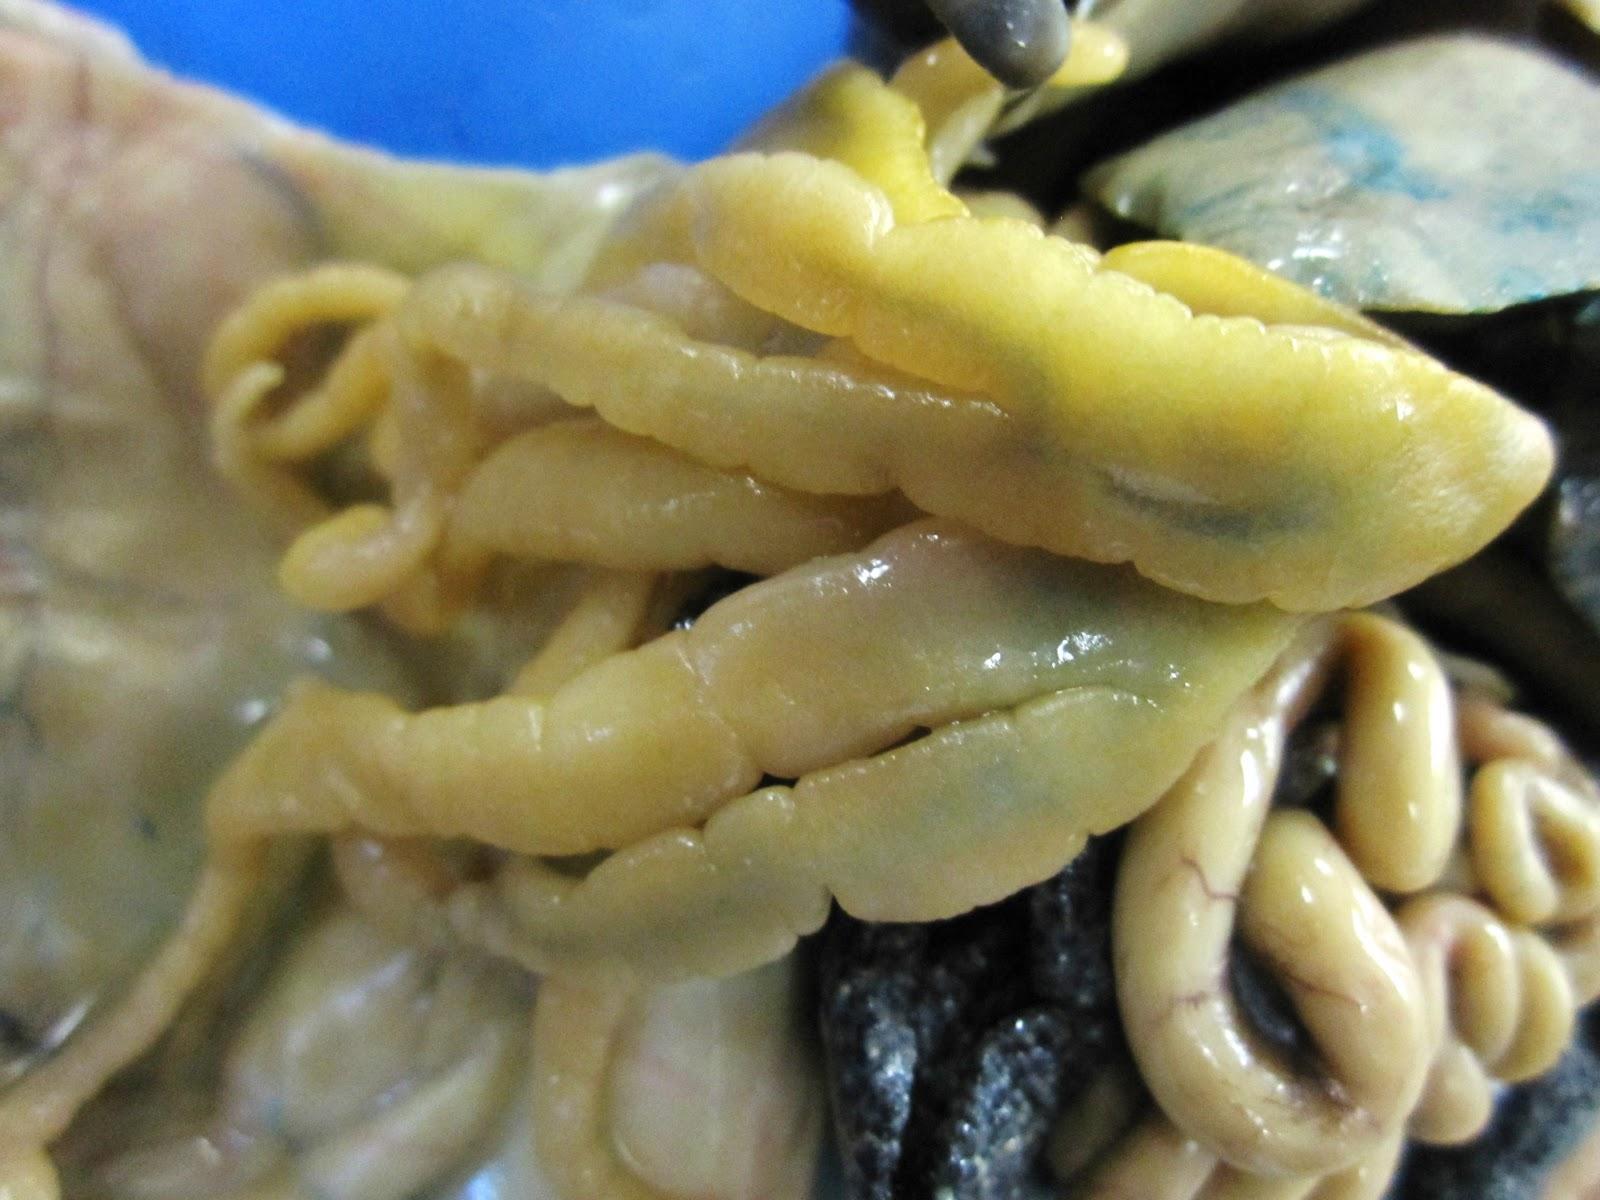 Biology 11 Bullfrog Dissection